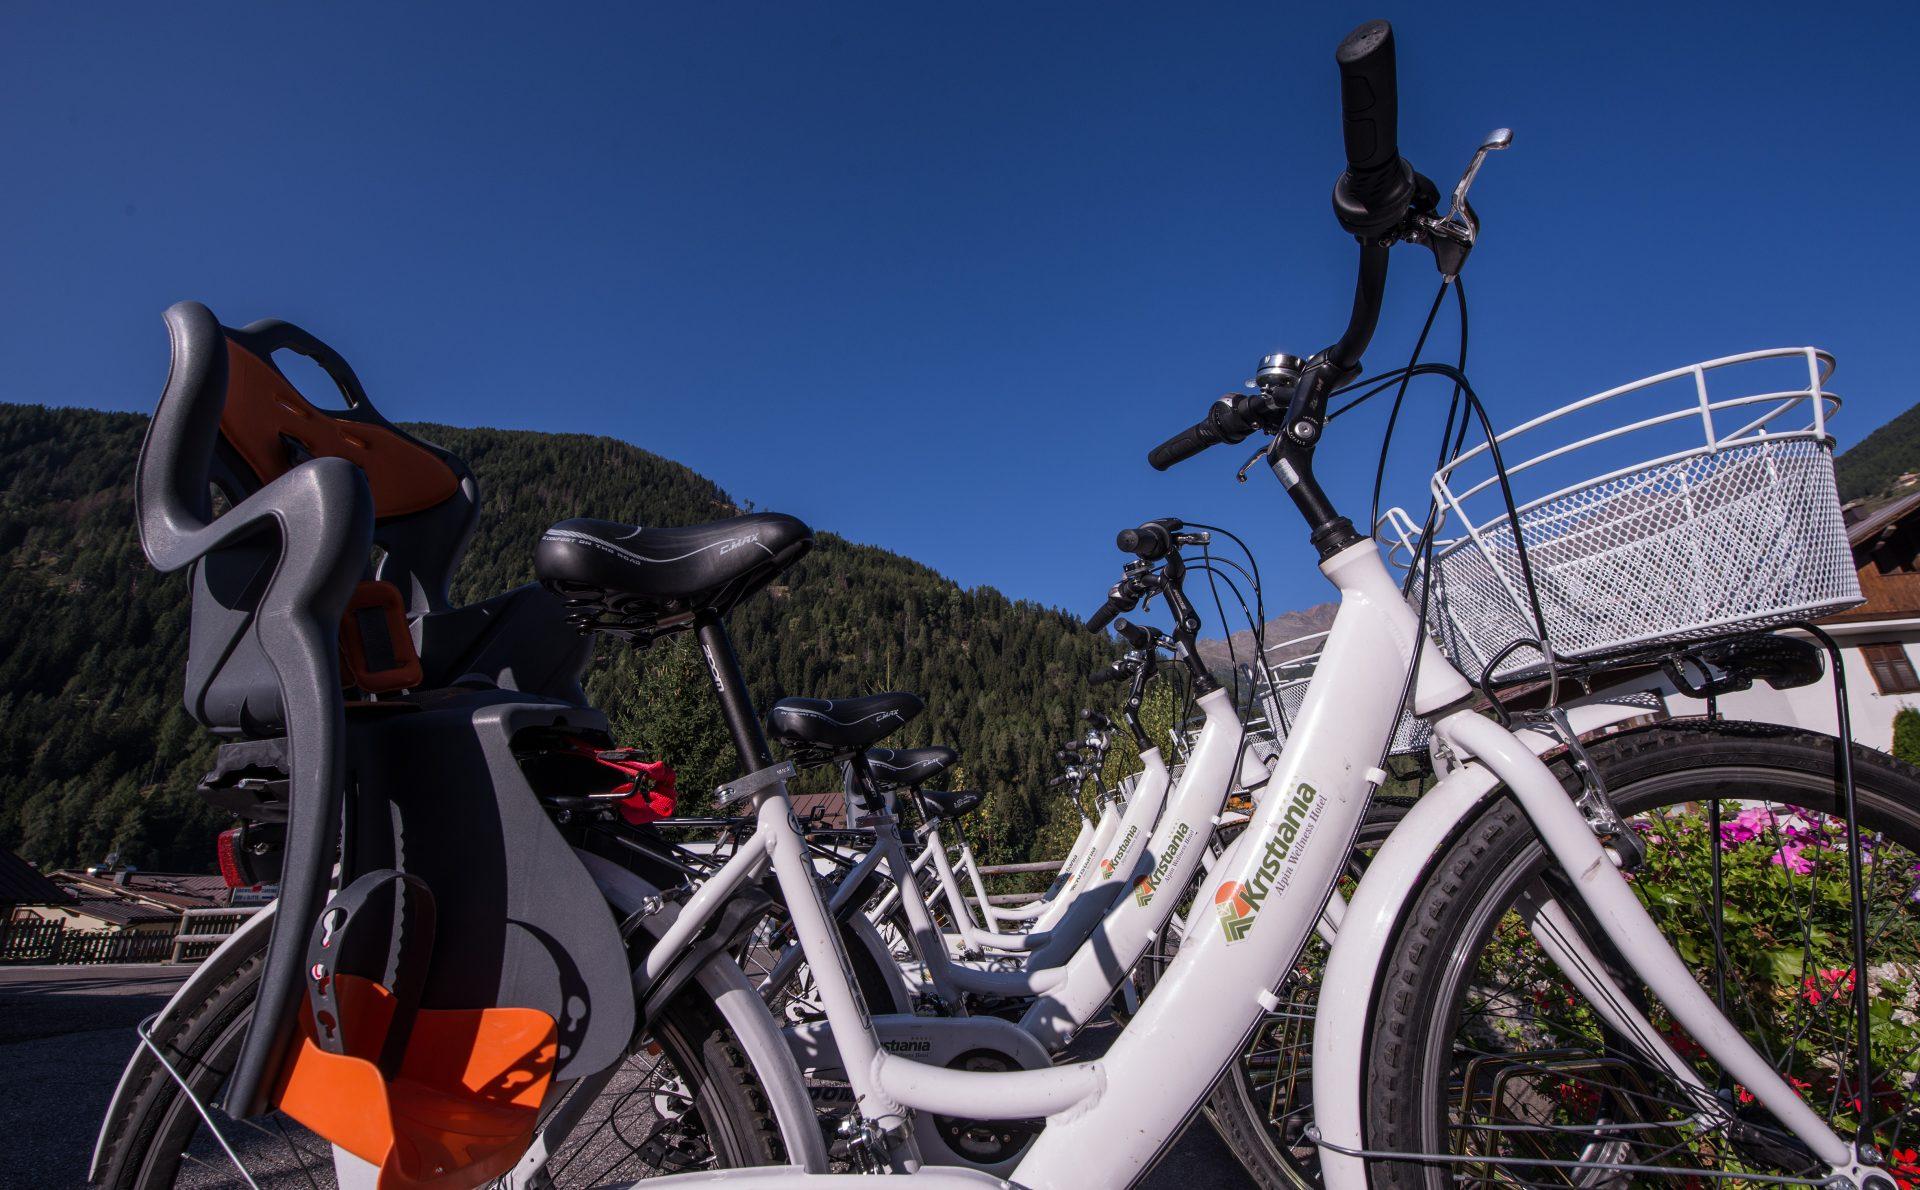 Immagine di testata per Bike hotel service per escursioni in bici a Pejo, Val di Sole